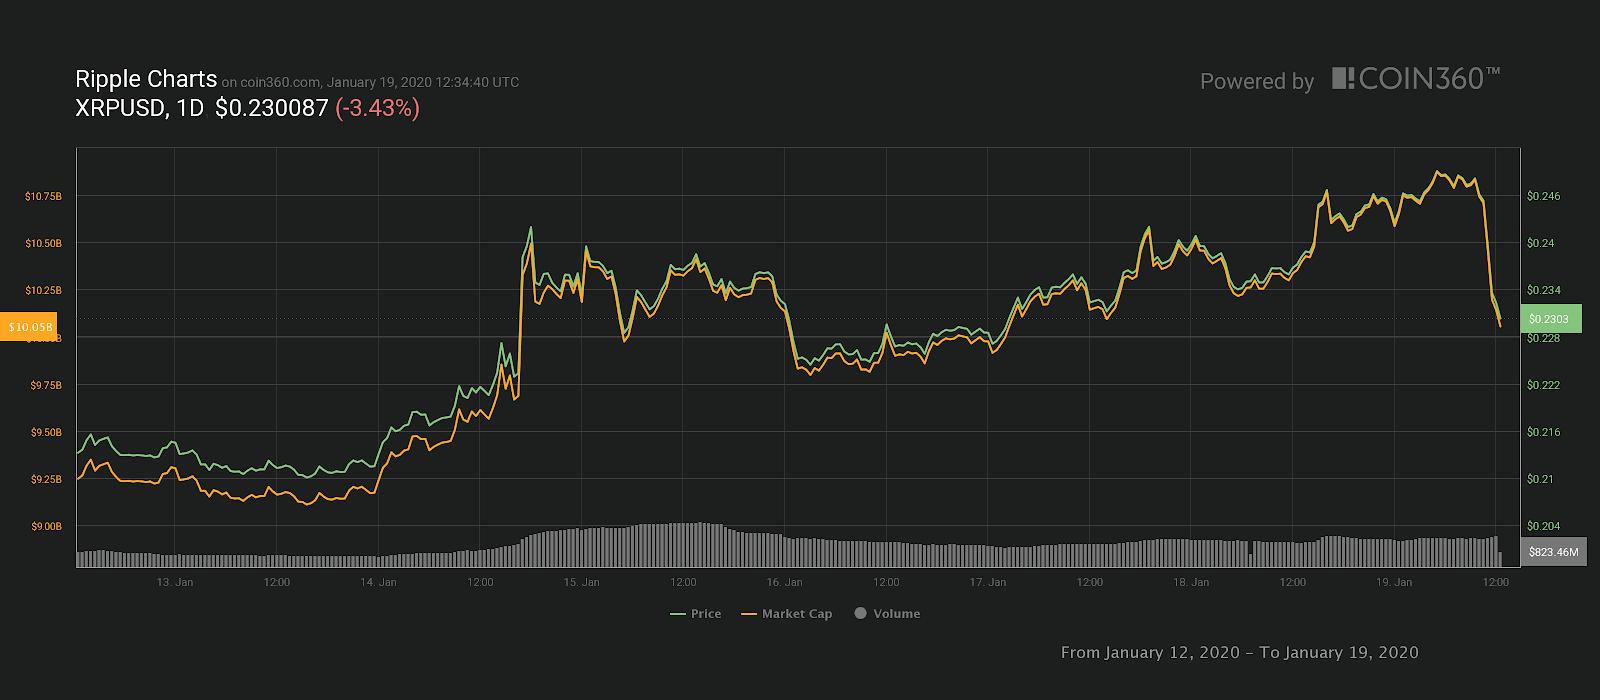 Bitcoin ร่วงหนักกว่า $500 ภายใน 5 นาที เหรียญ Altcoin ชั้นนำแดงทั้งกระดาน